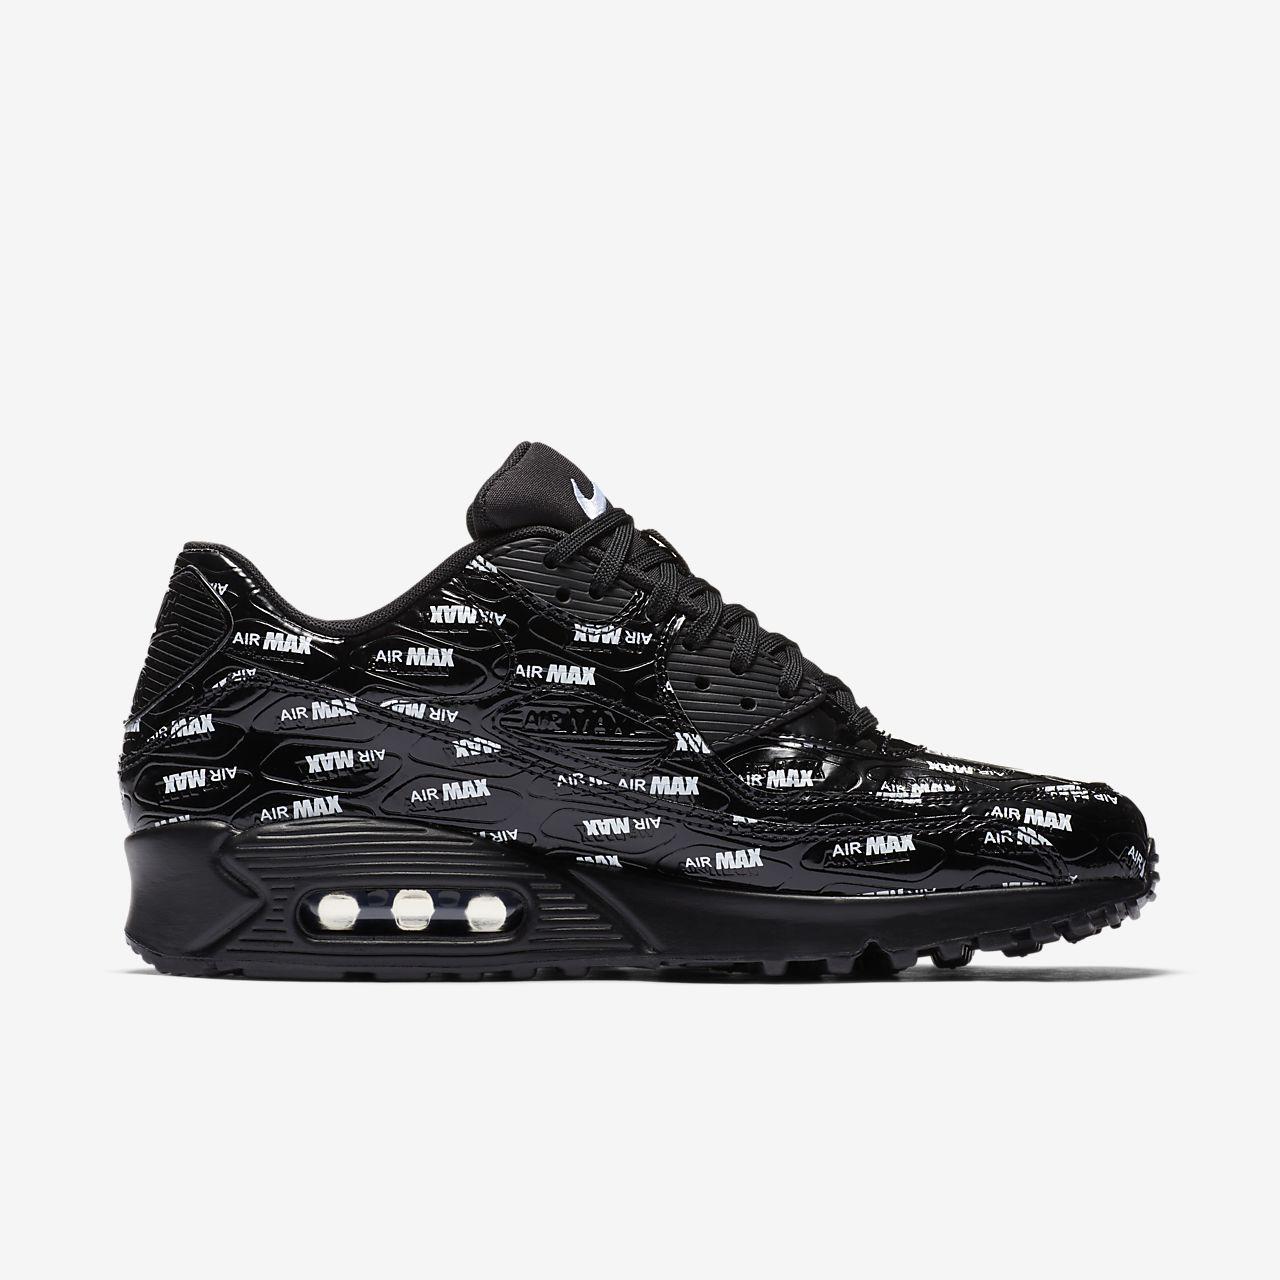 online retailer ec9e7 3f2c6 ... Nike Air Max 90 Premium Herrenschuh